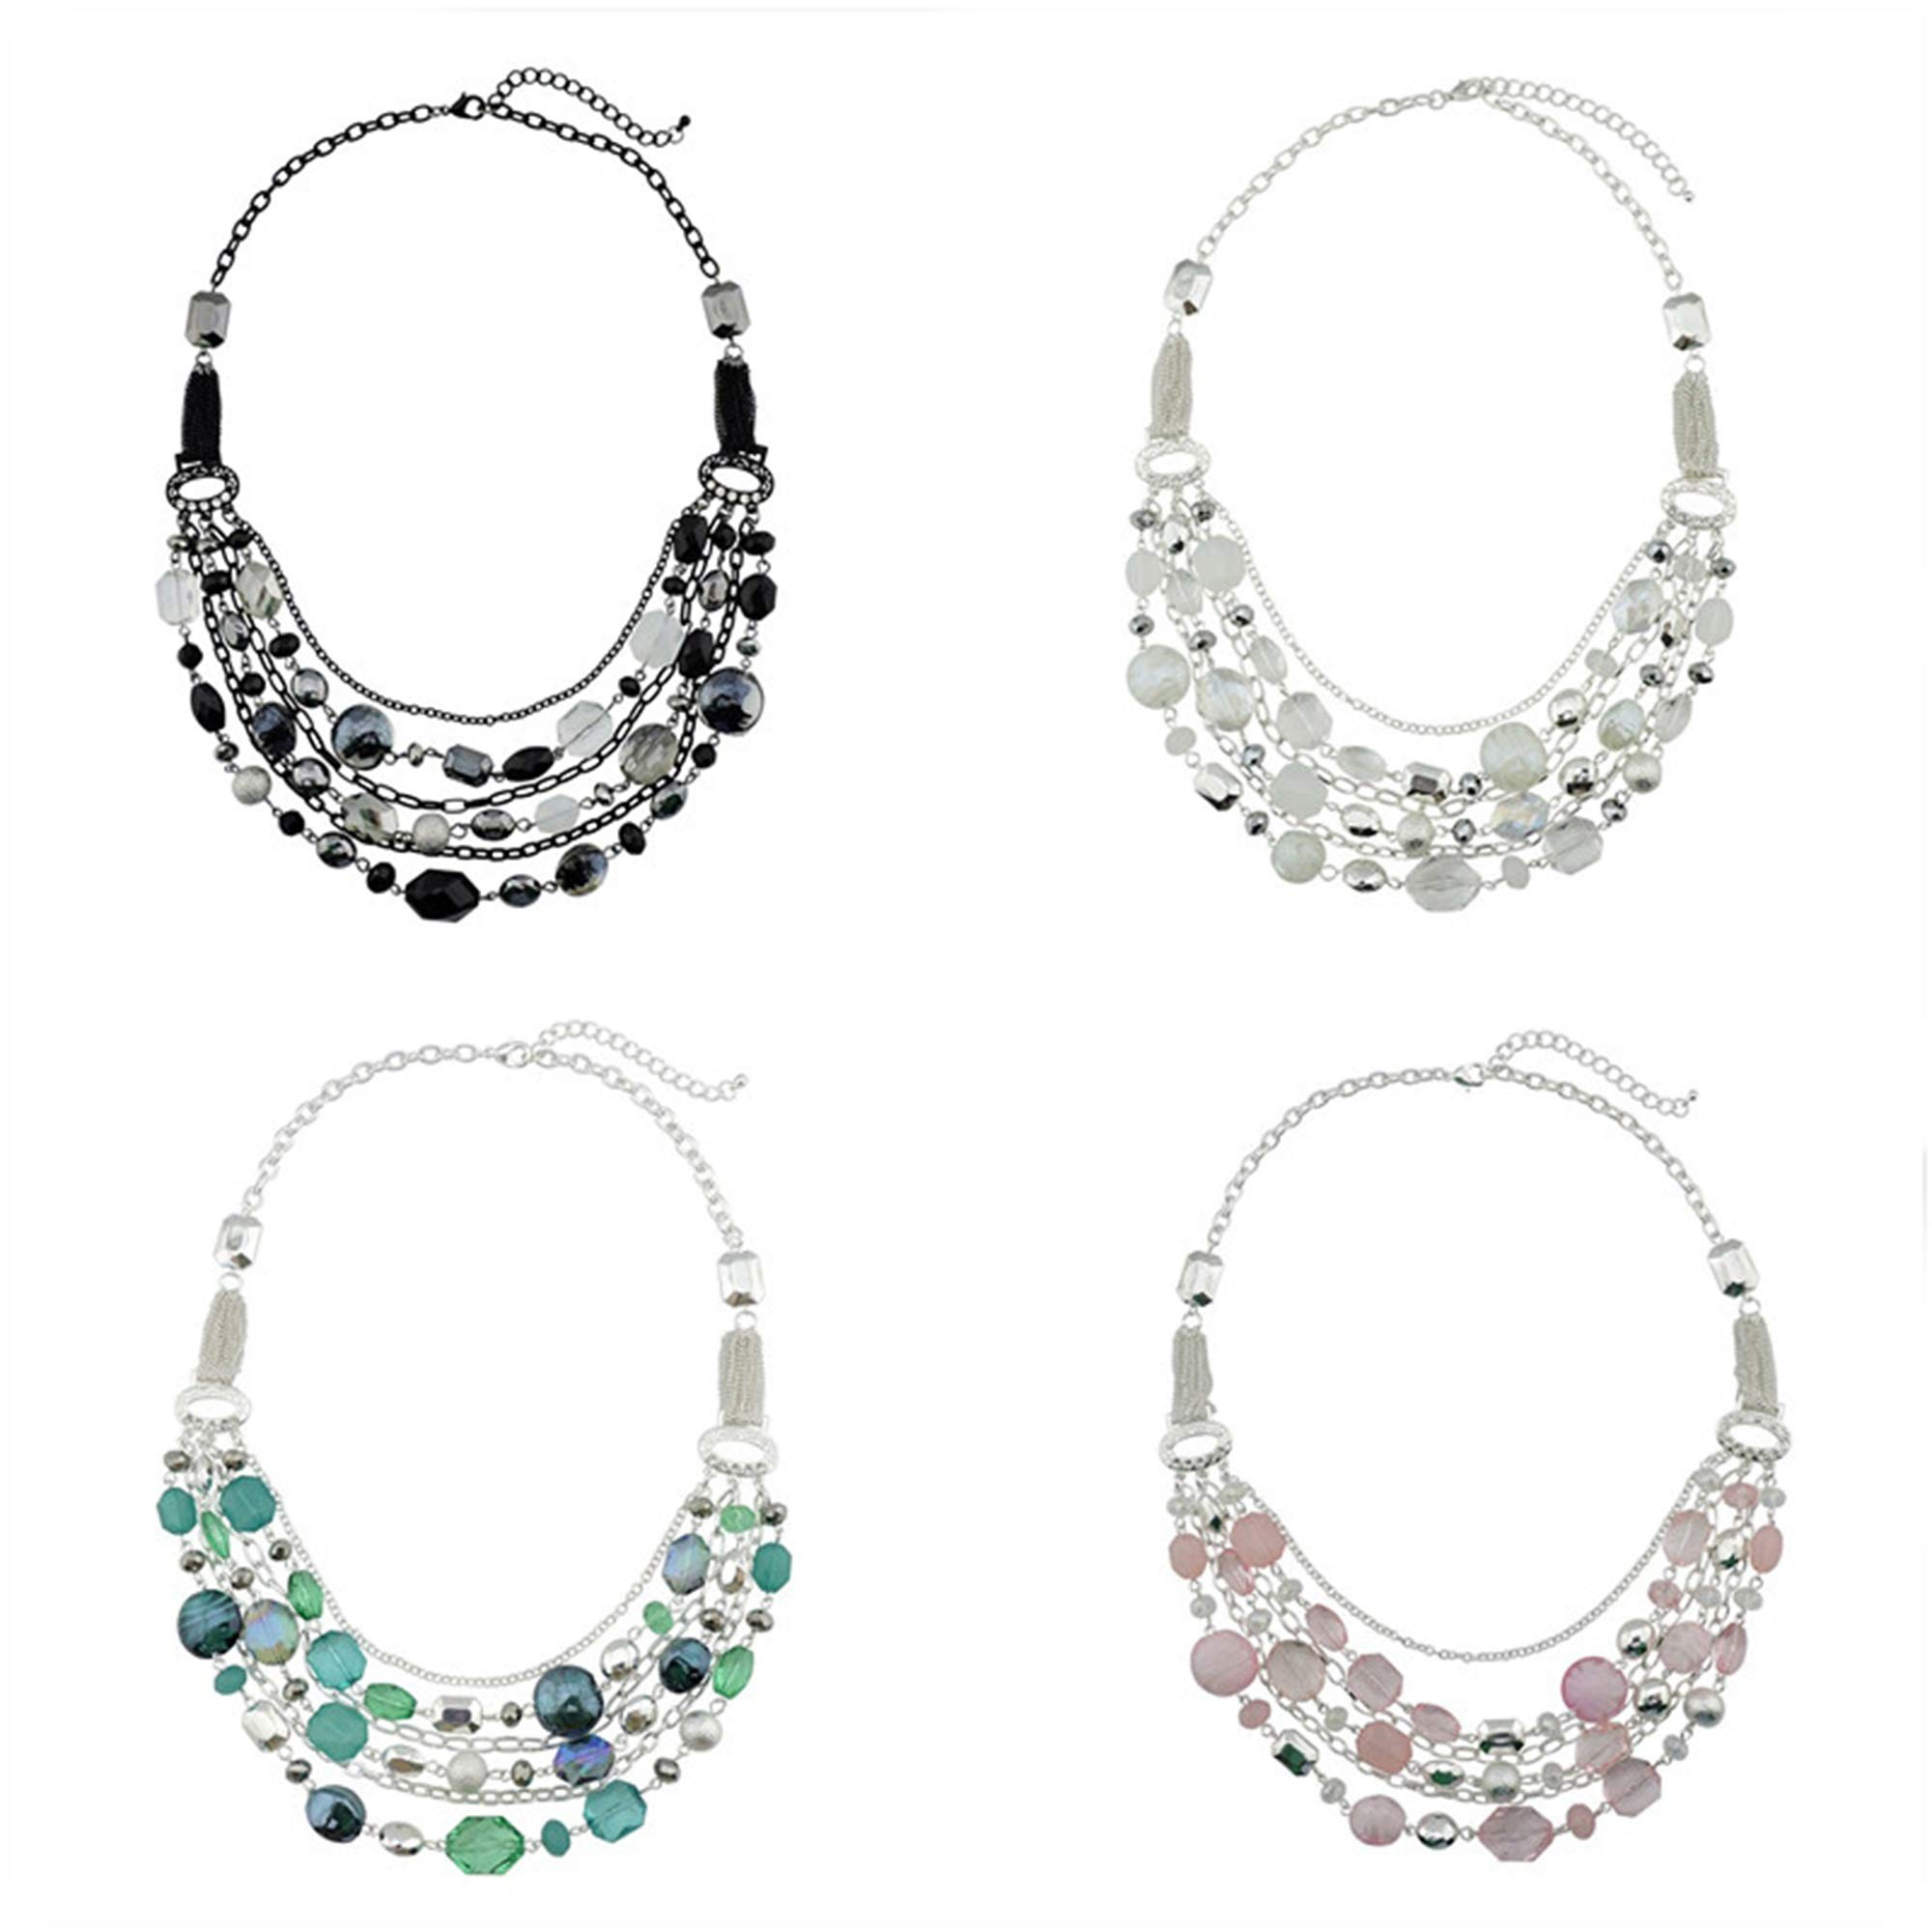 Bocar 4 PCS Newest Multi Layer Chain Crystal Colored Glaze Statement Women Strand Necklace (NK-10061-1 Set)